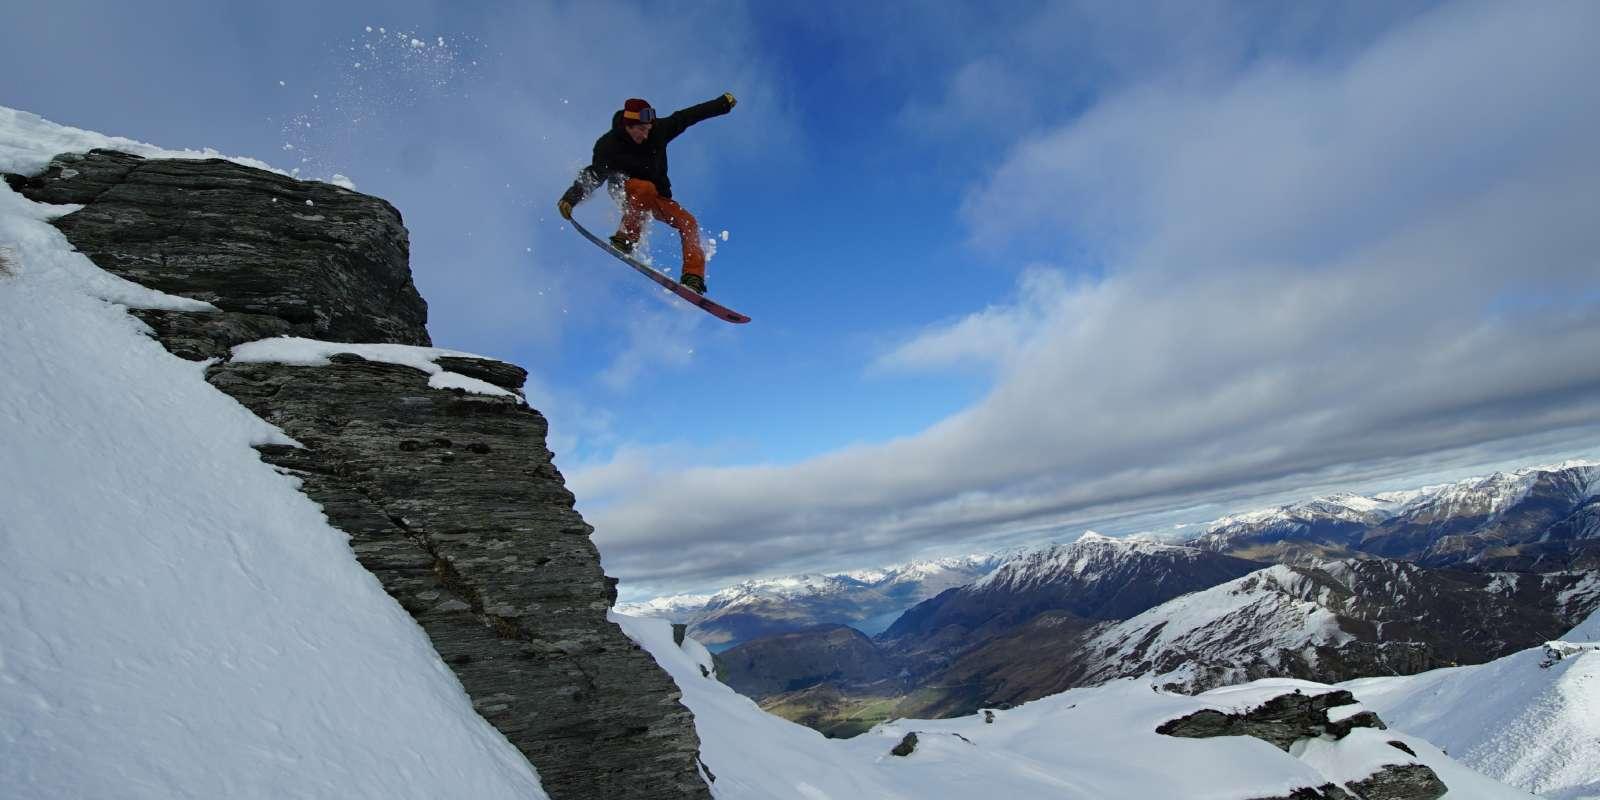 Snowboarder getting air at Coronet Peak